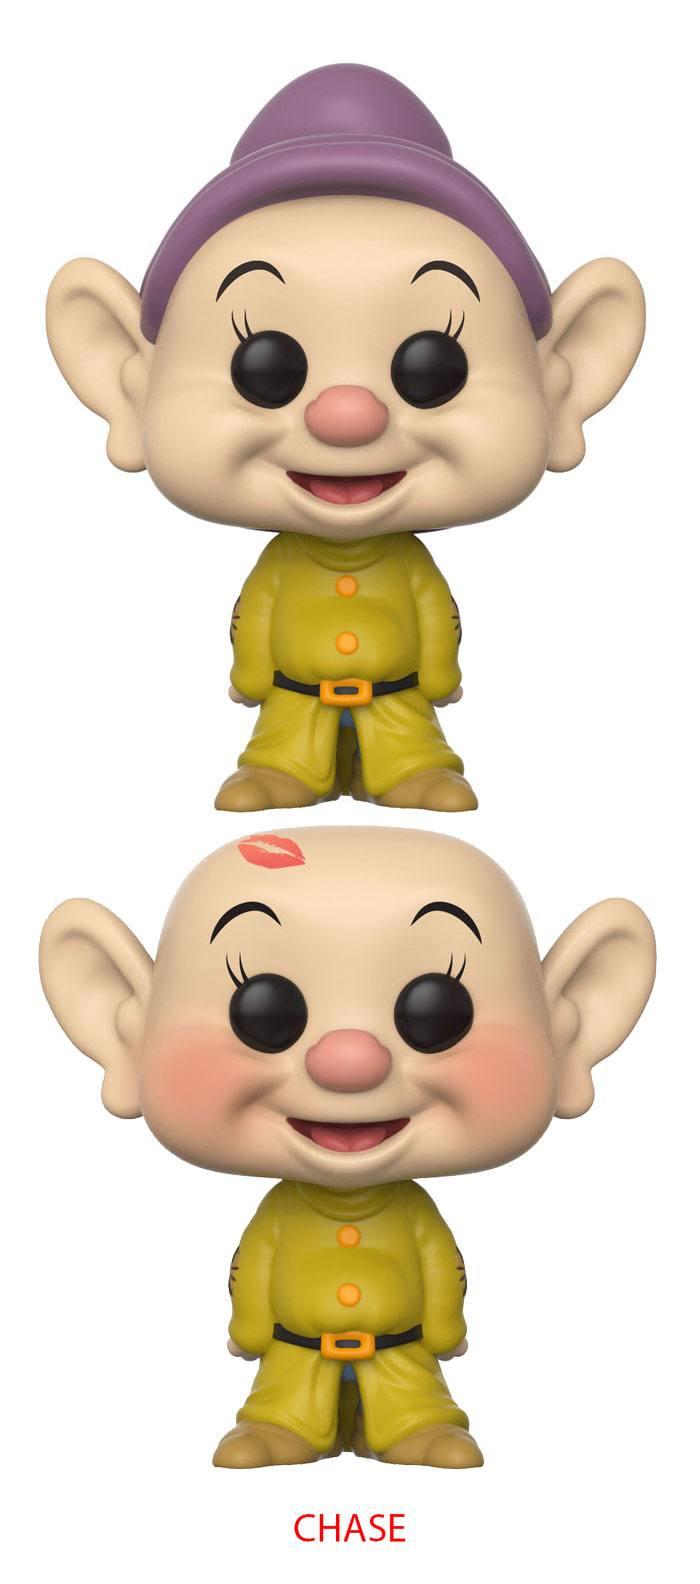 Snow White and the Seven Dwarfs POP! Disney Figures Dopey 9 cm Assortment (6)